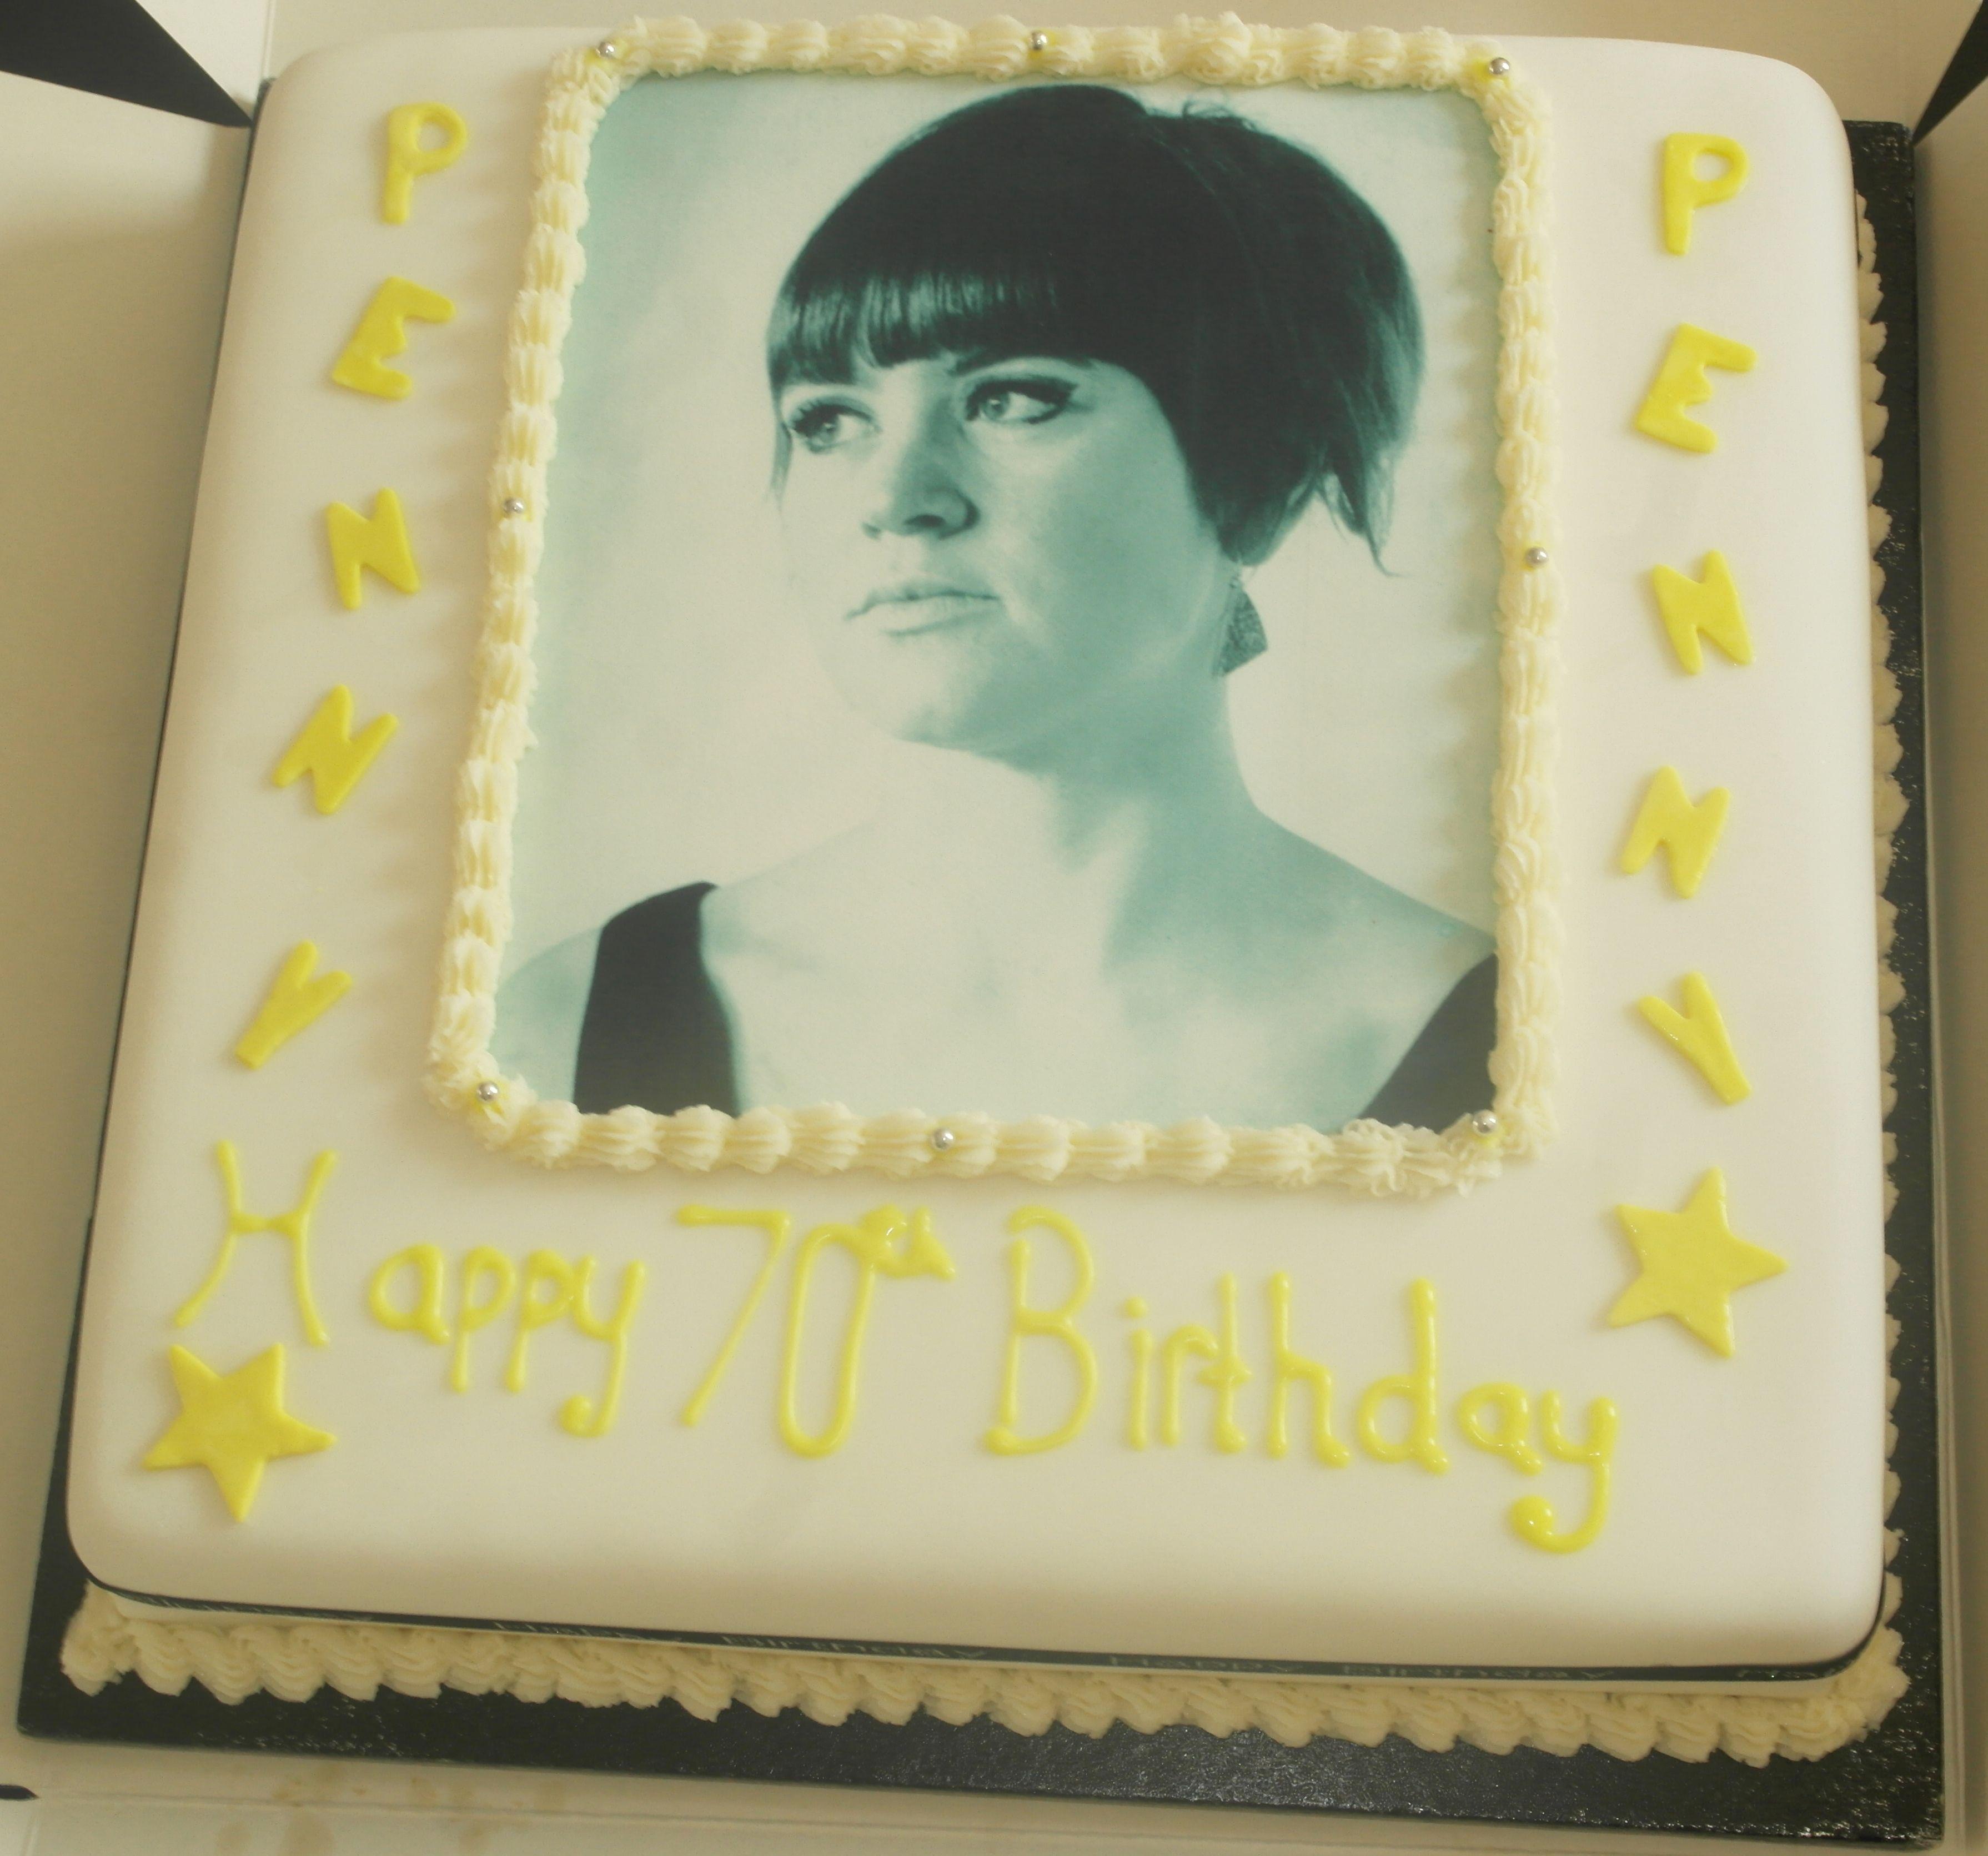 Happy 70th Birthday Cake Rum cake, 70th birthday cake